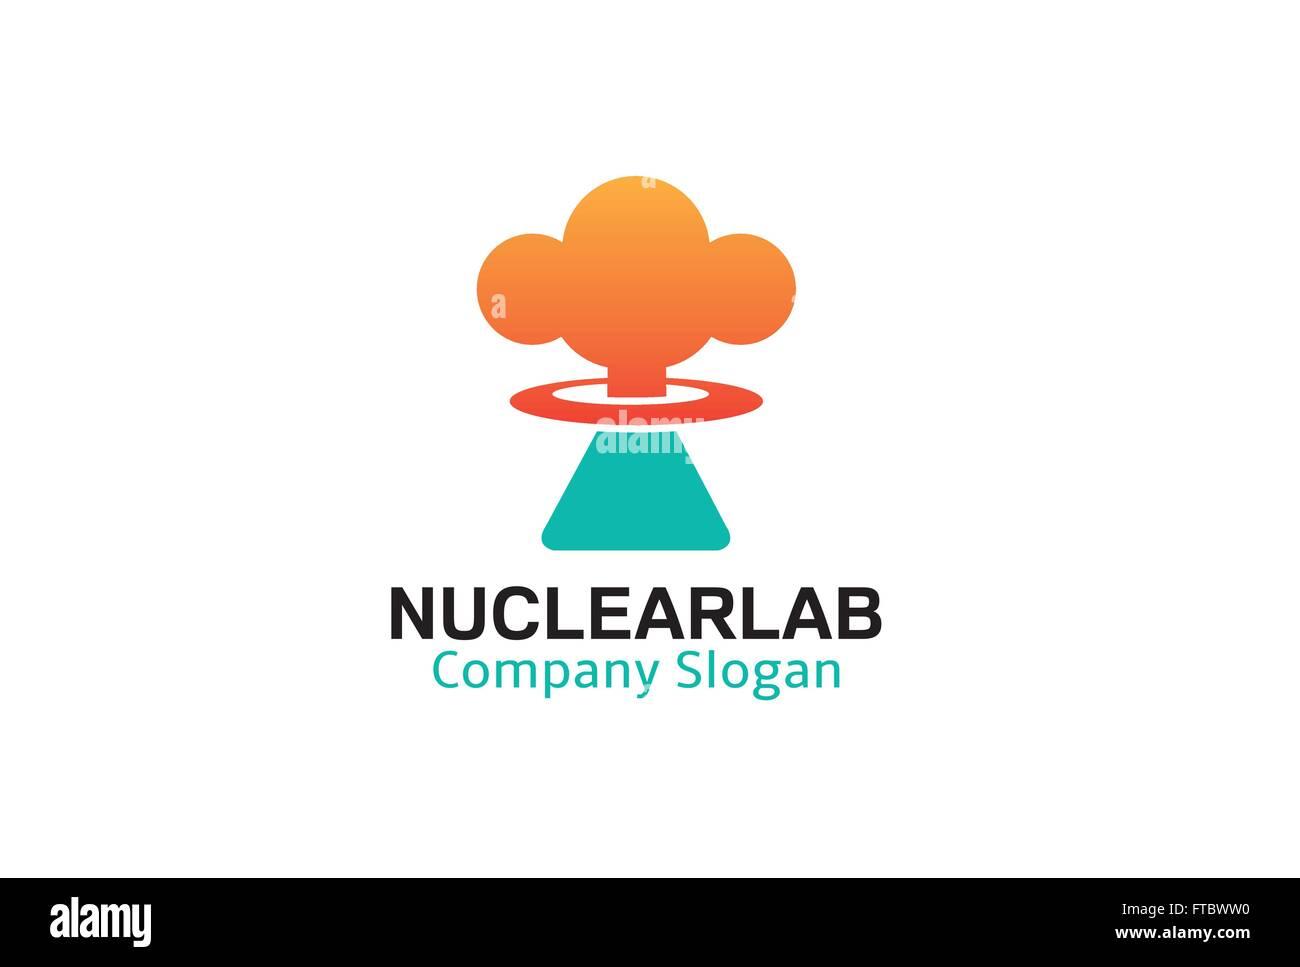 Nuclear Lab Design Illustration - Stock Vector